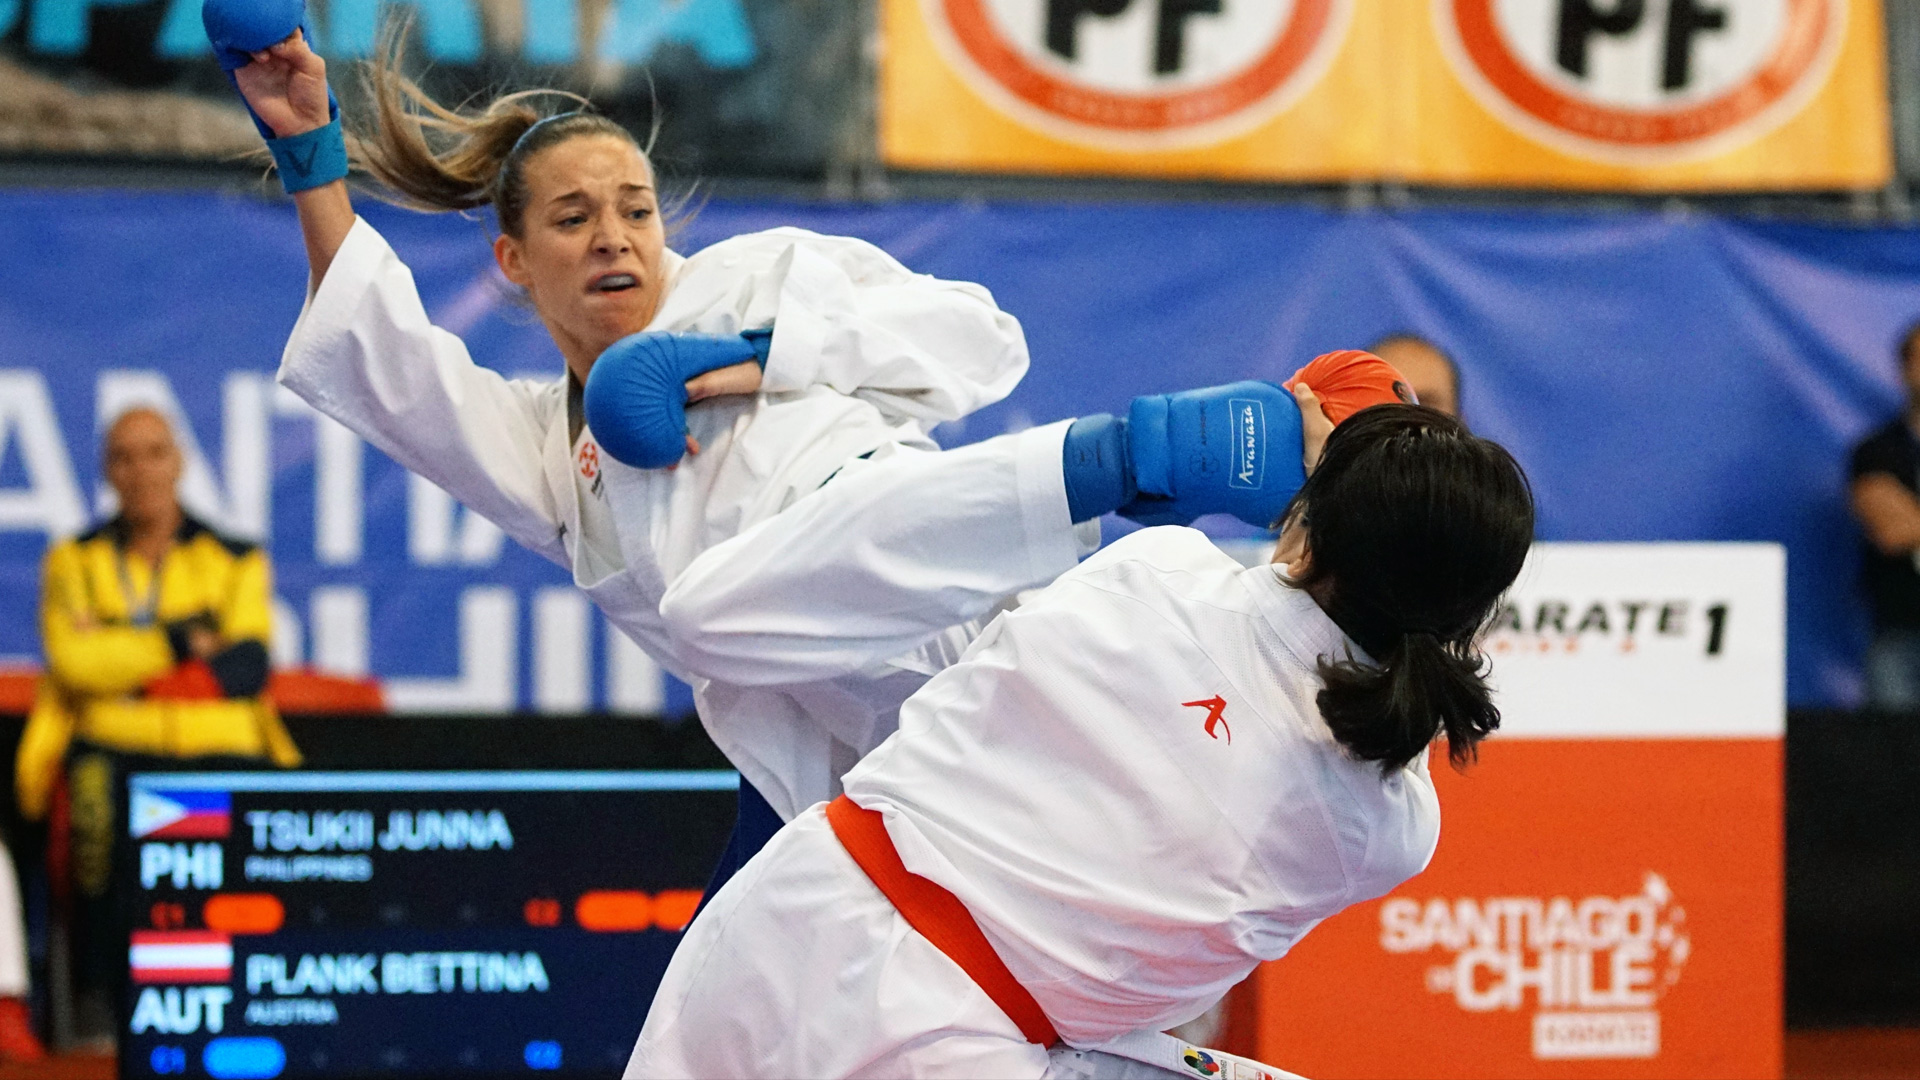 Karate Austria News   Bettina Plank mit Fieber erkrankt   Antritt beim Serie A Turnier in Santiago de Chile   früh ausgeschieden